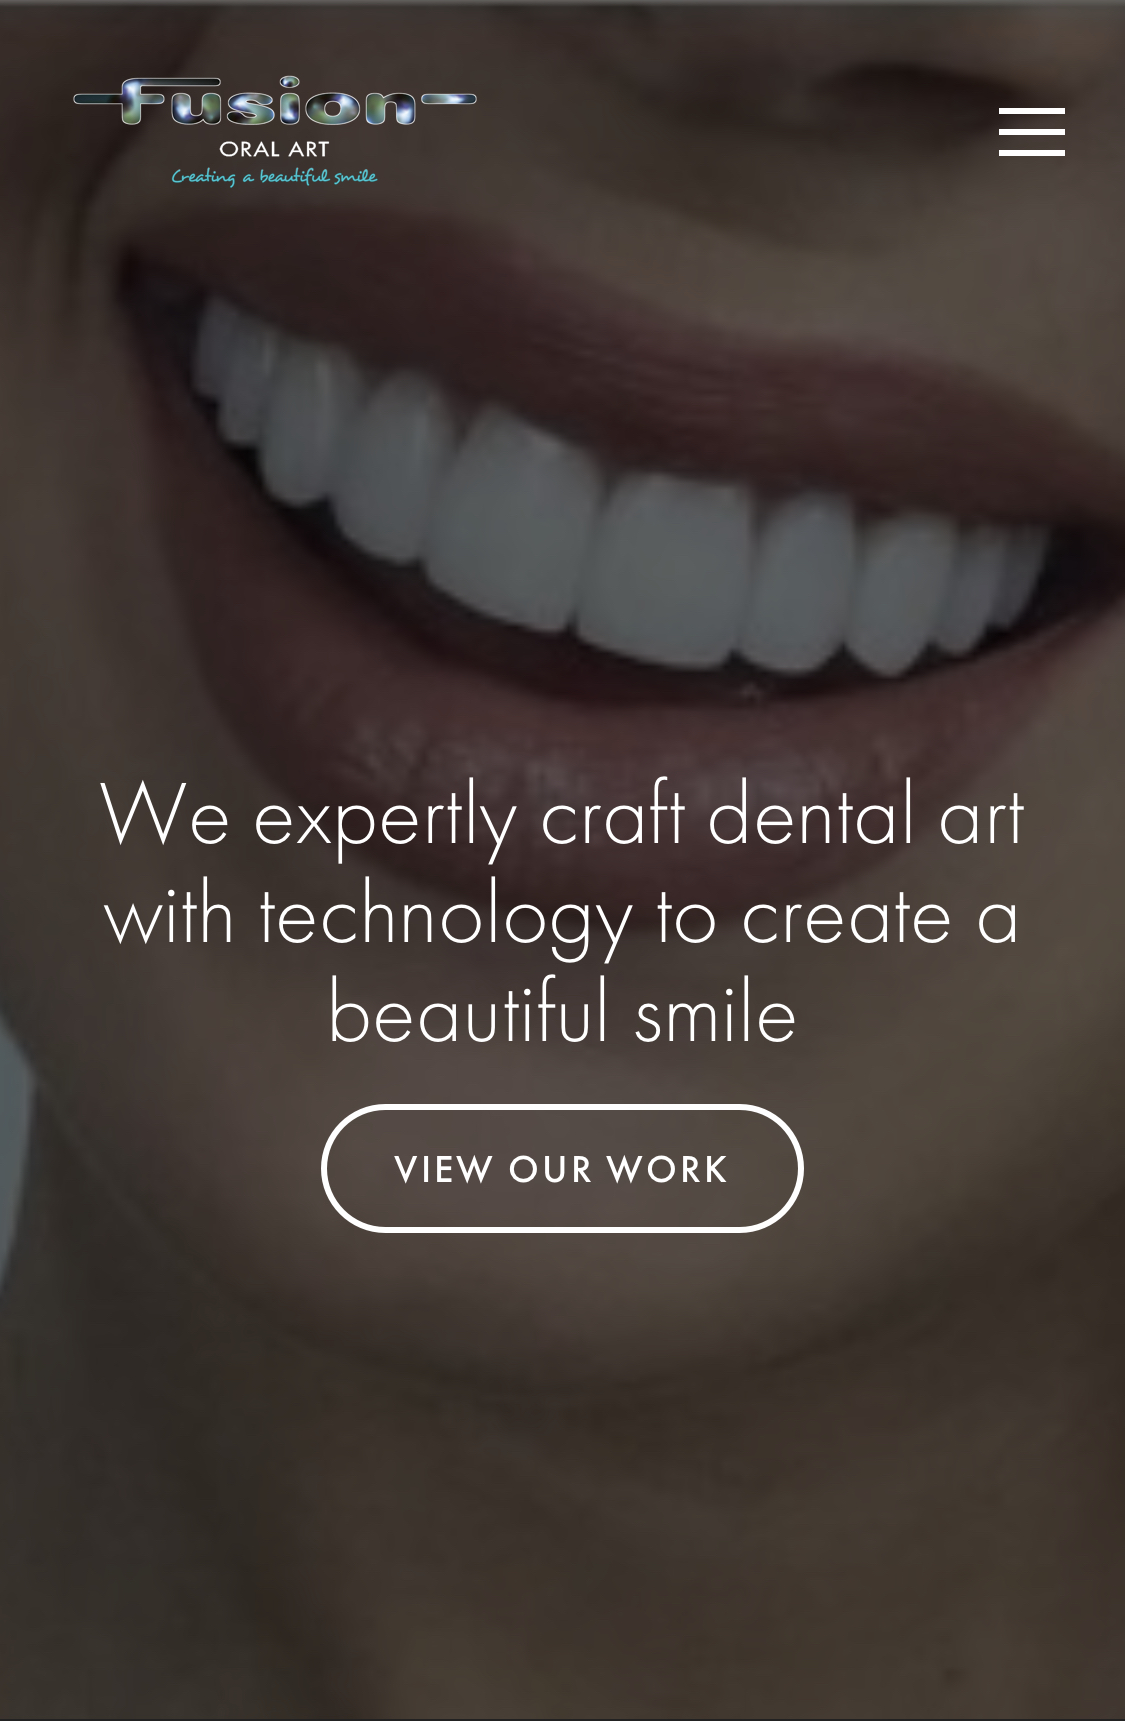 Fusion Oral Art